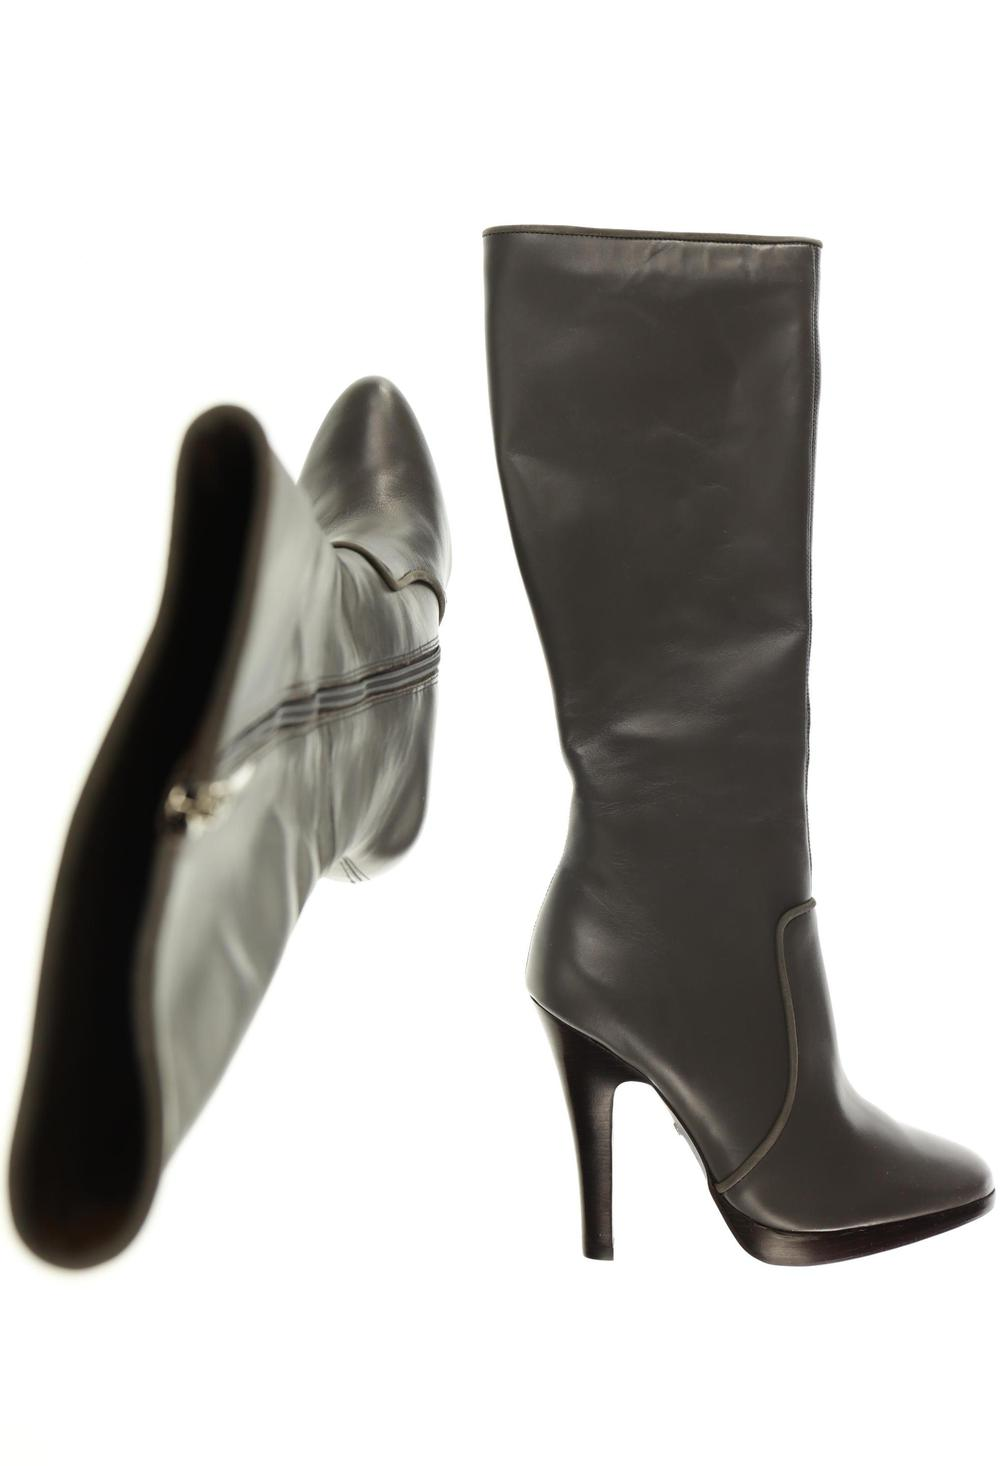 promo code 3eba0 7455a Buffalo Stiefel Damen Boots Gr. DE 39 Leder grau #8395a70 | eBay